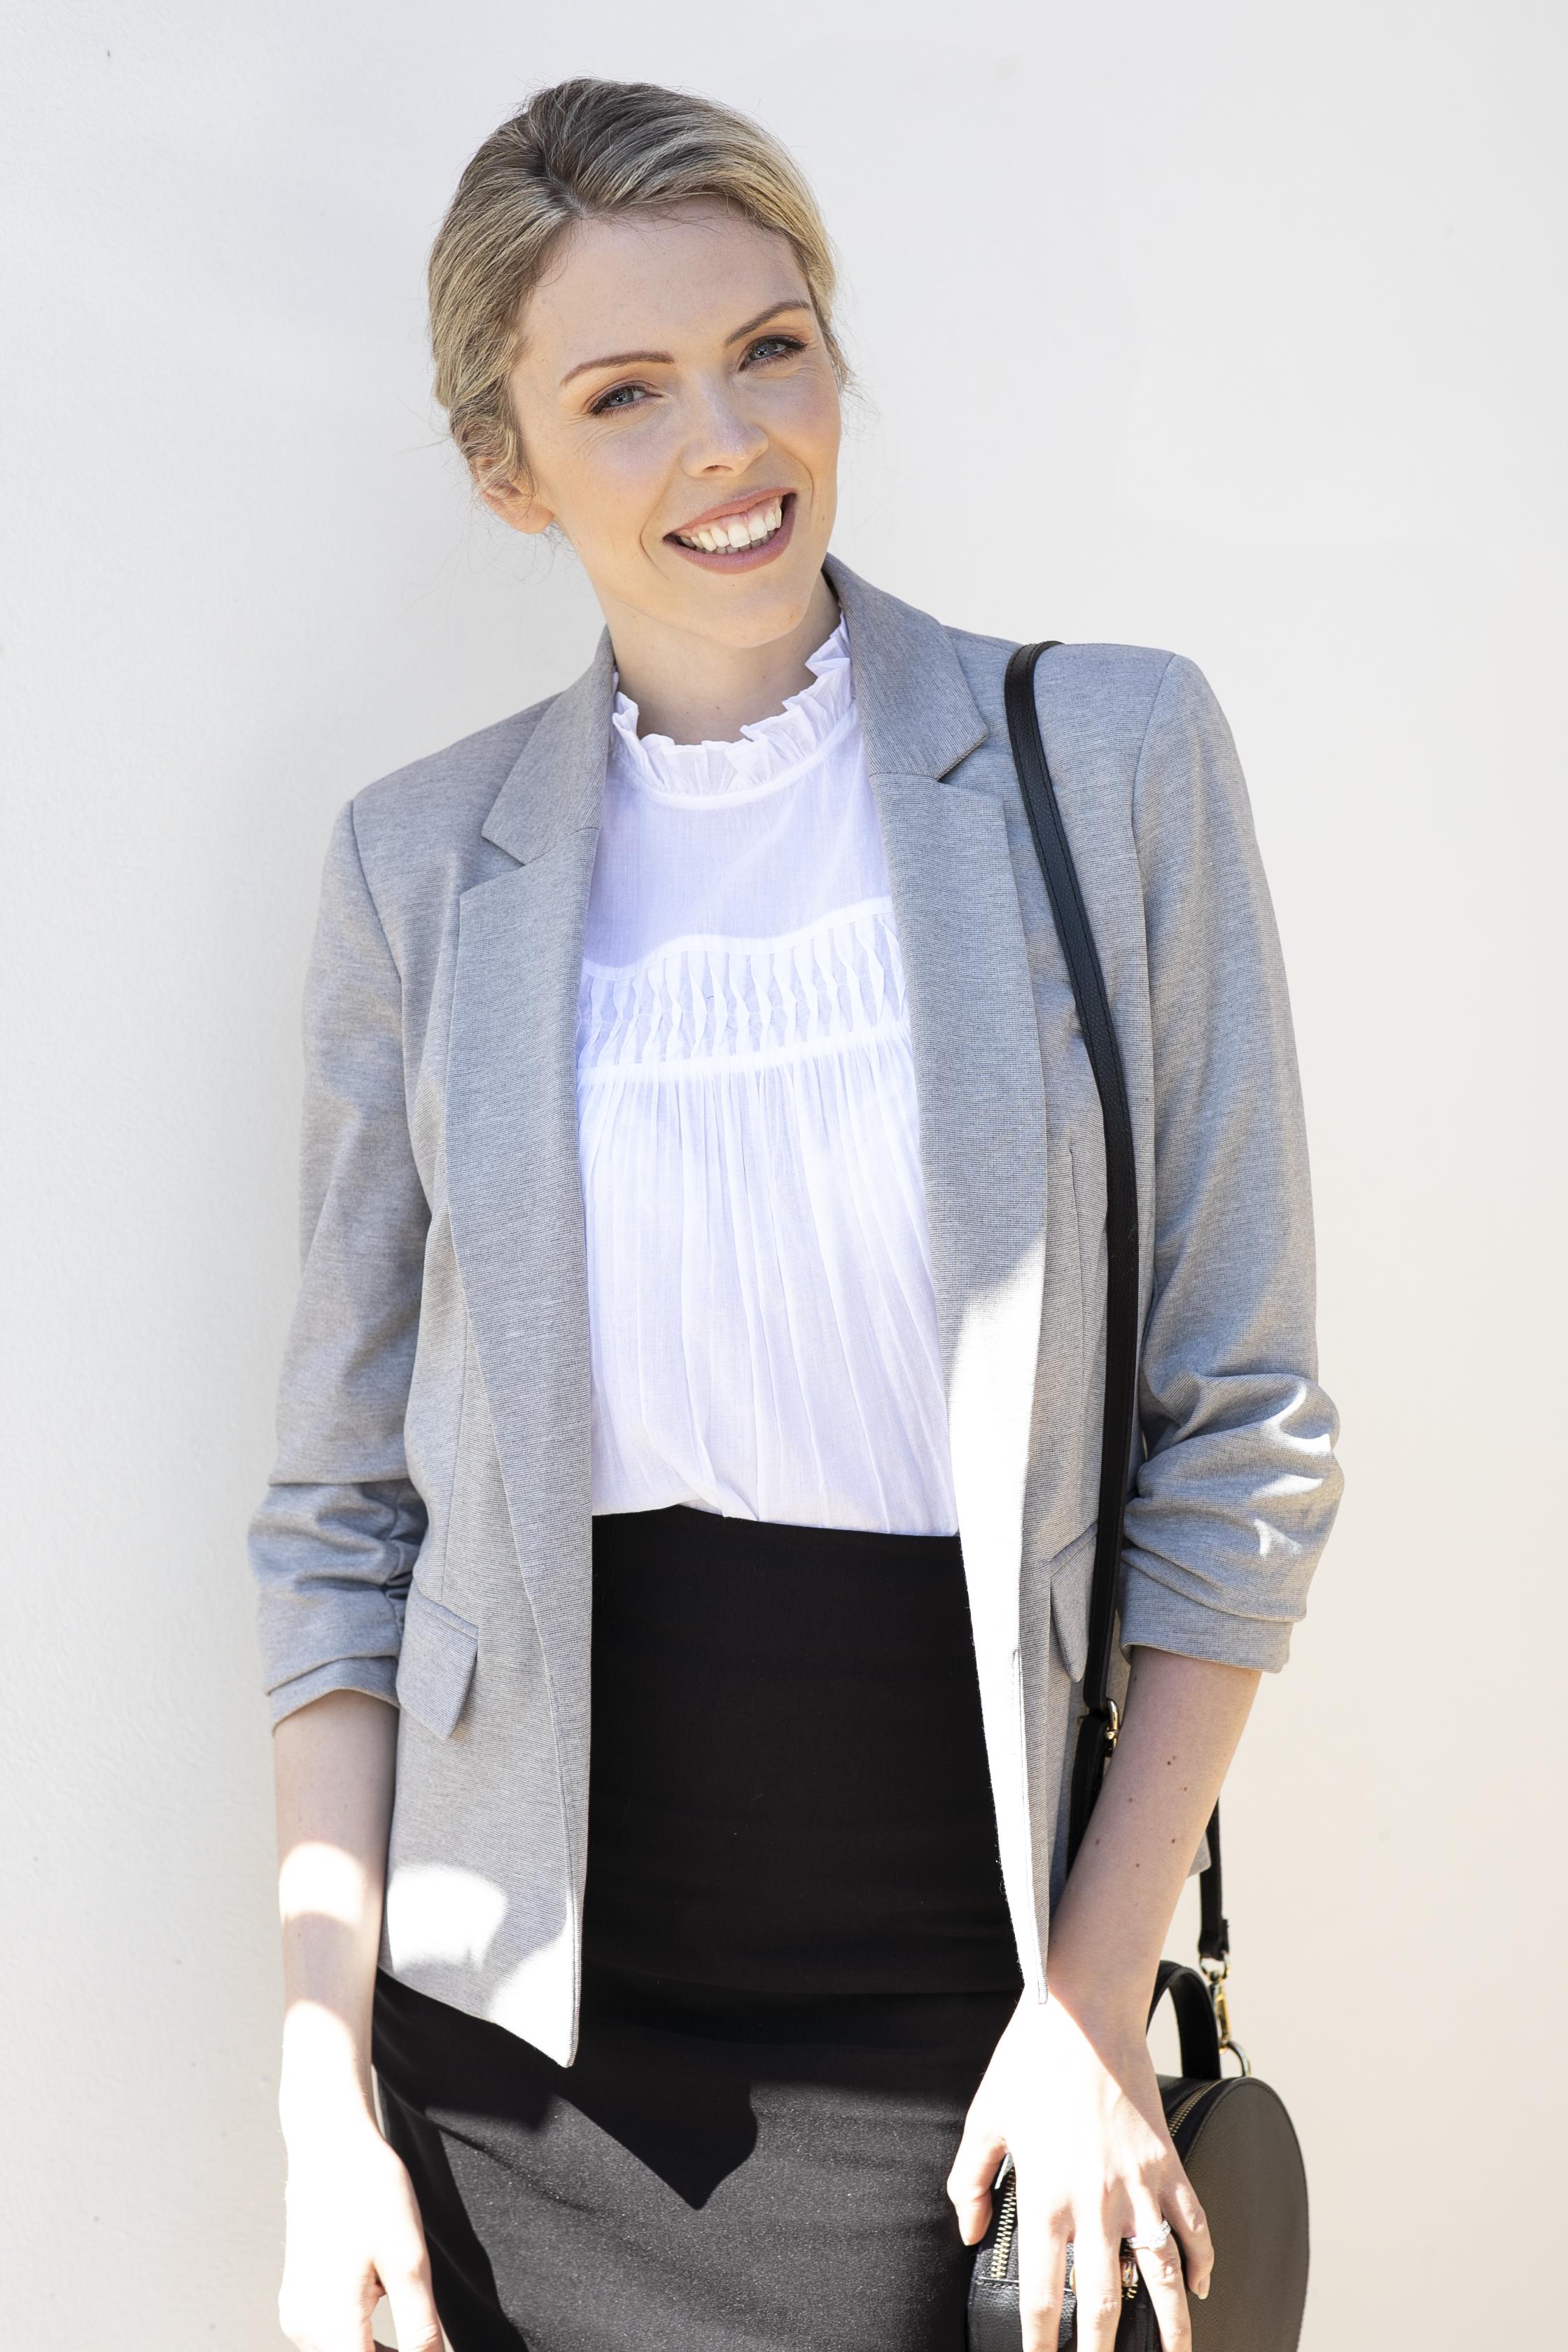 Shine-Model-Management-Lynne-Manchester-UK-Notth-Fitness-and-commerical-01.jpg#asset:52769